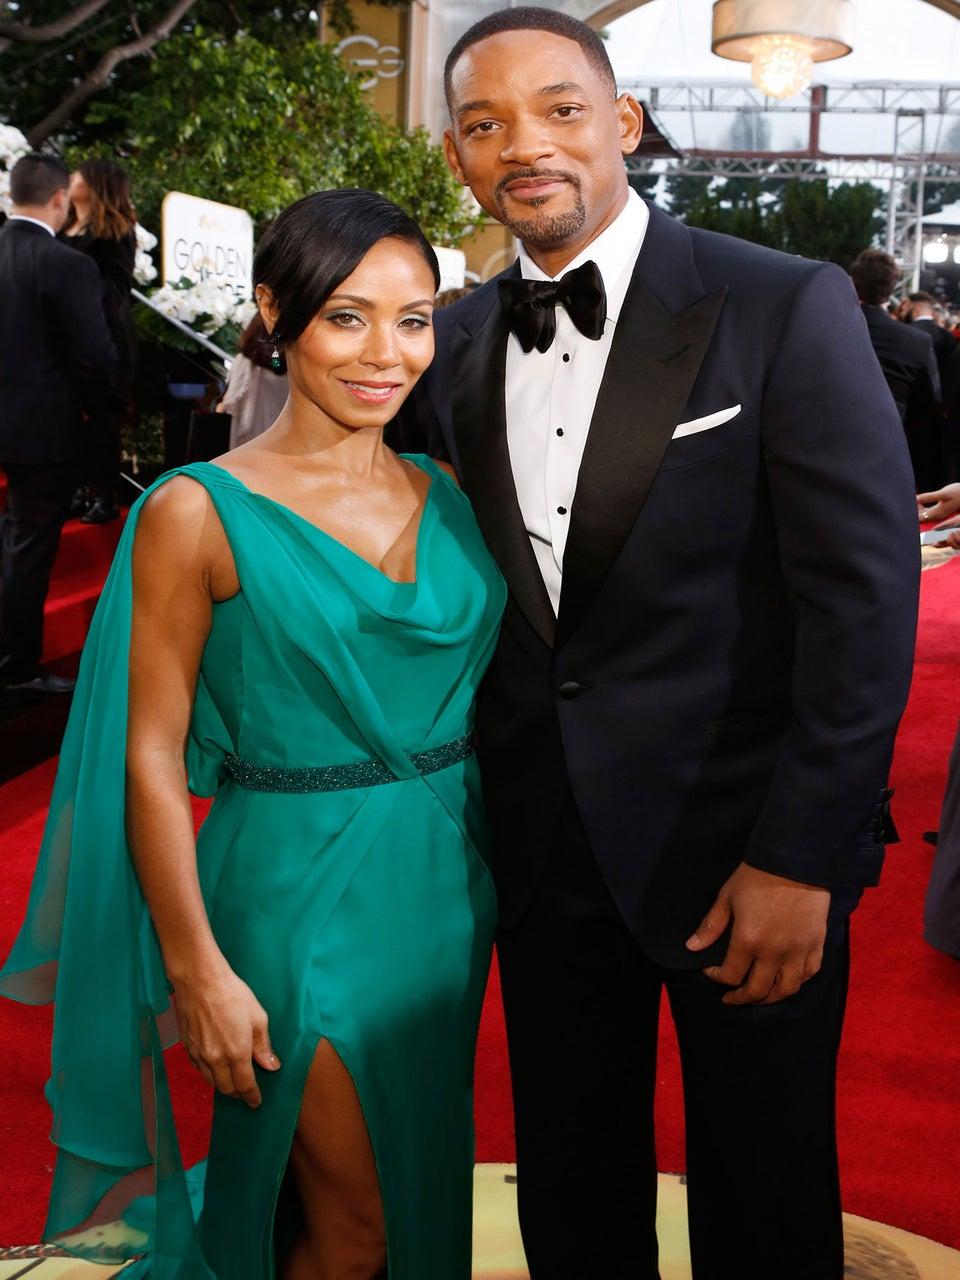 Jada Pinkett Smith Says Husband Will Is 'Perfect' AsAladdin's Genie: He's 'Always Creating Magic'